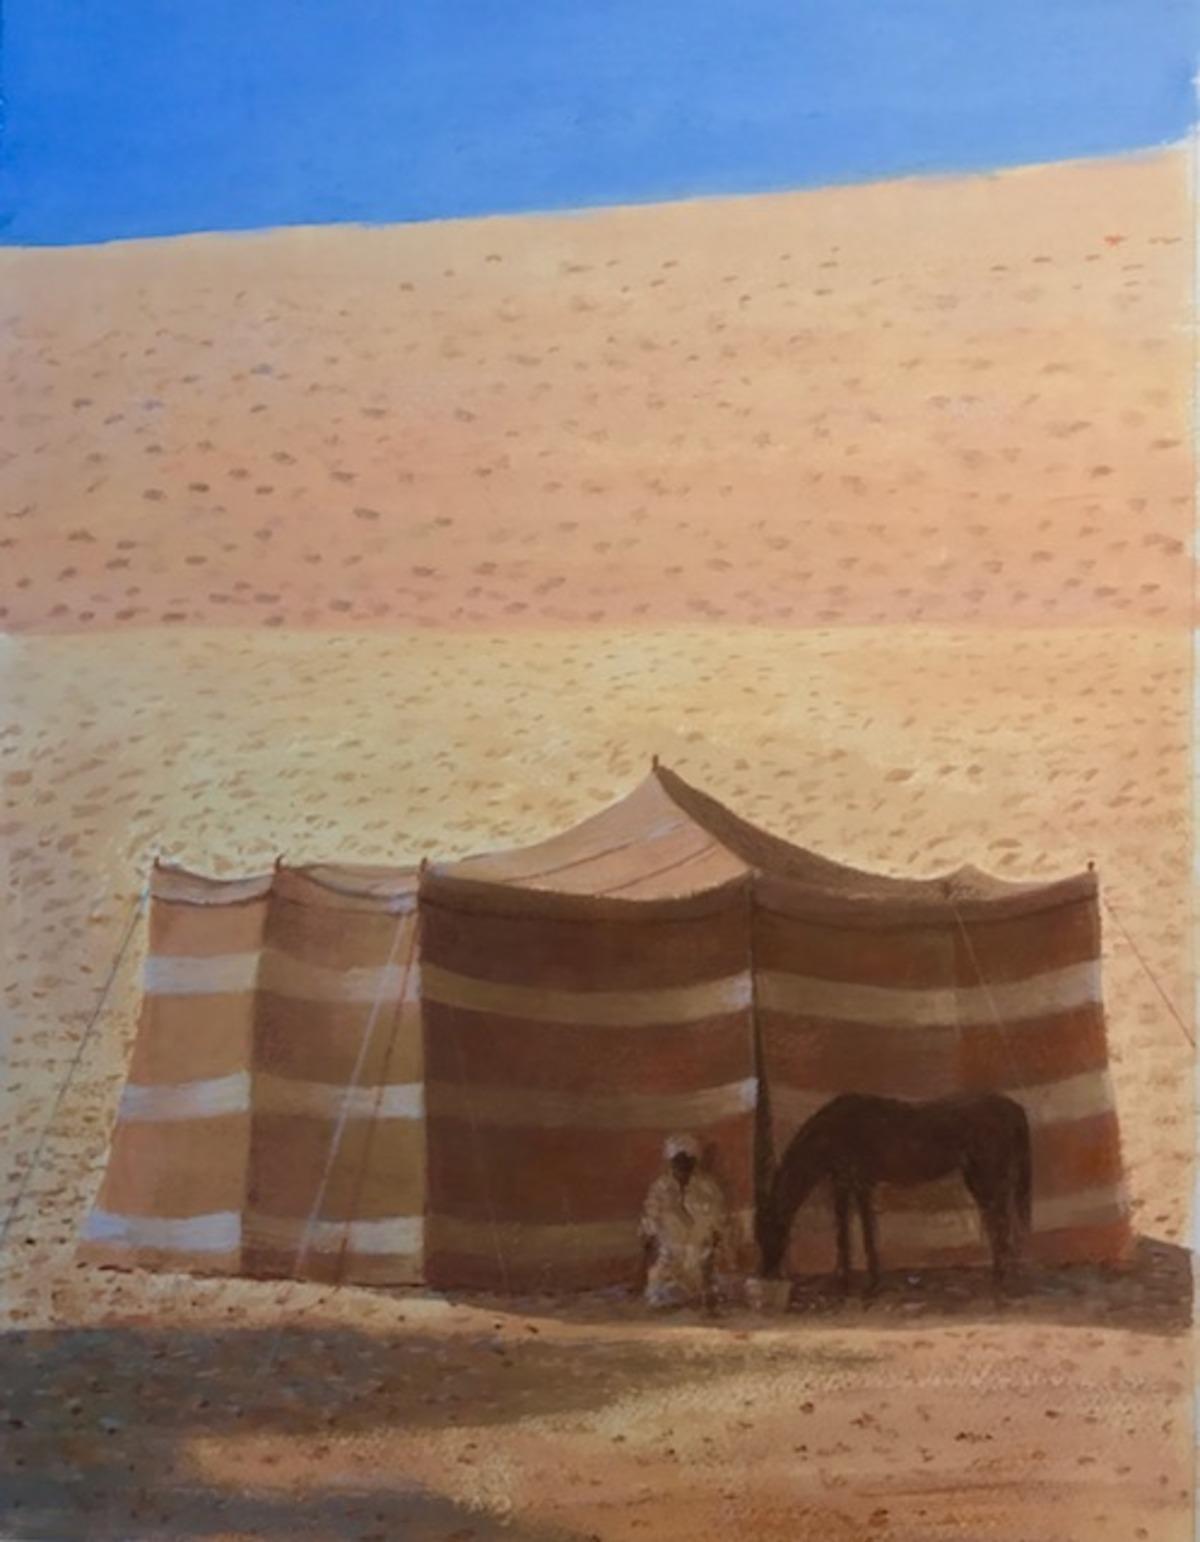 Desert tent, man and horse